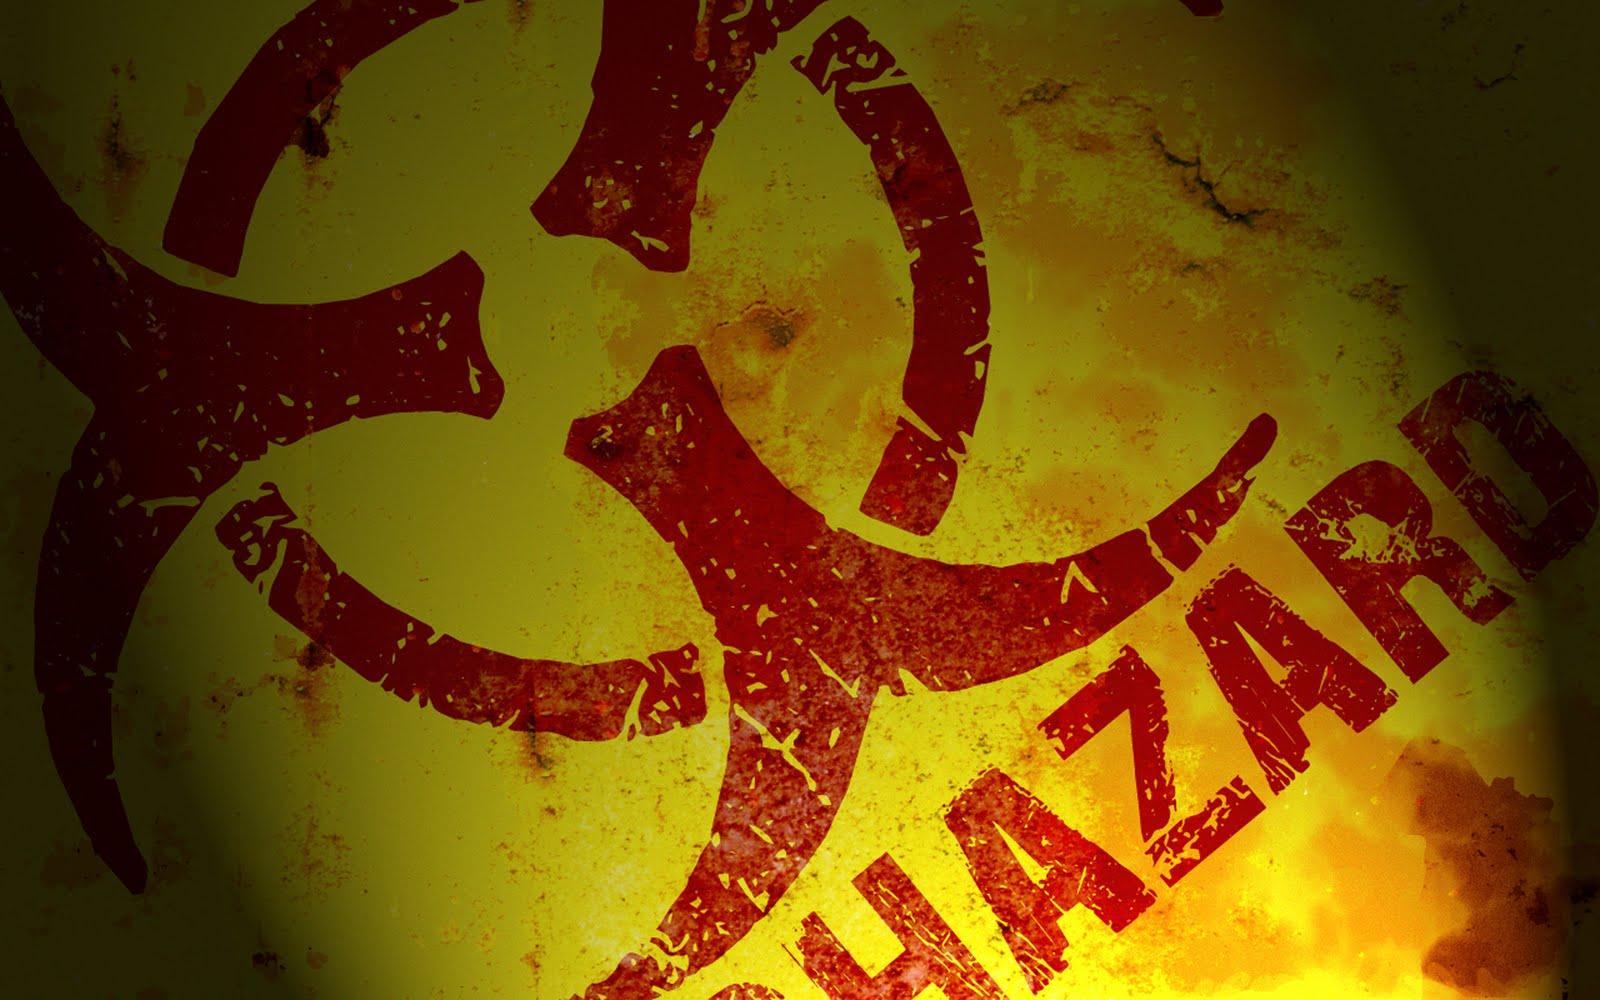 Biohazard Warning Signs Logo HD Wallpapers Desktop Wallpapers 1600x1000